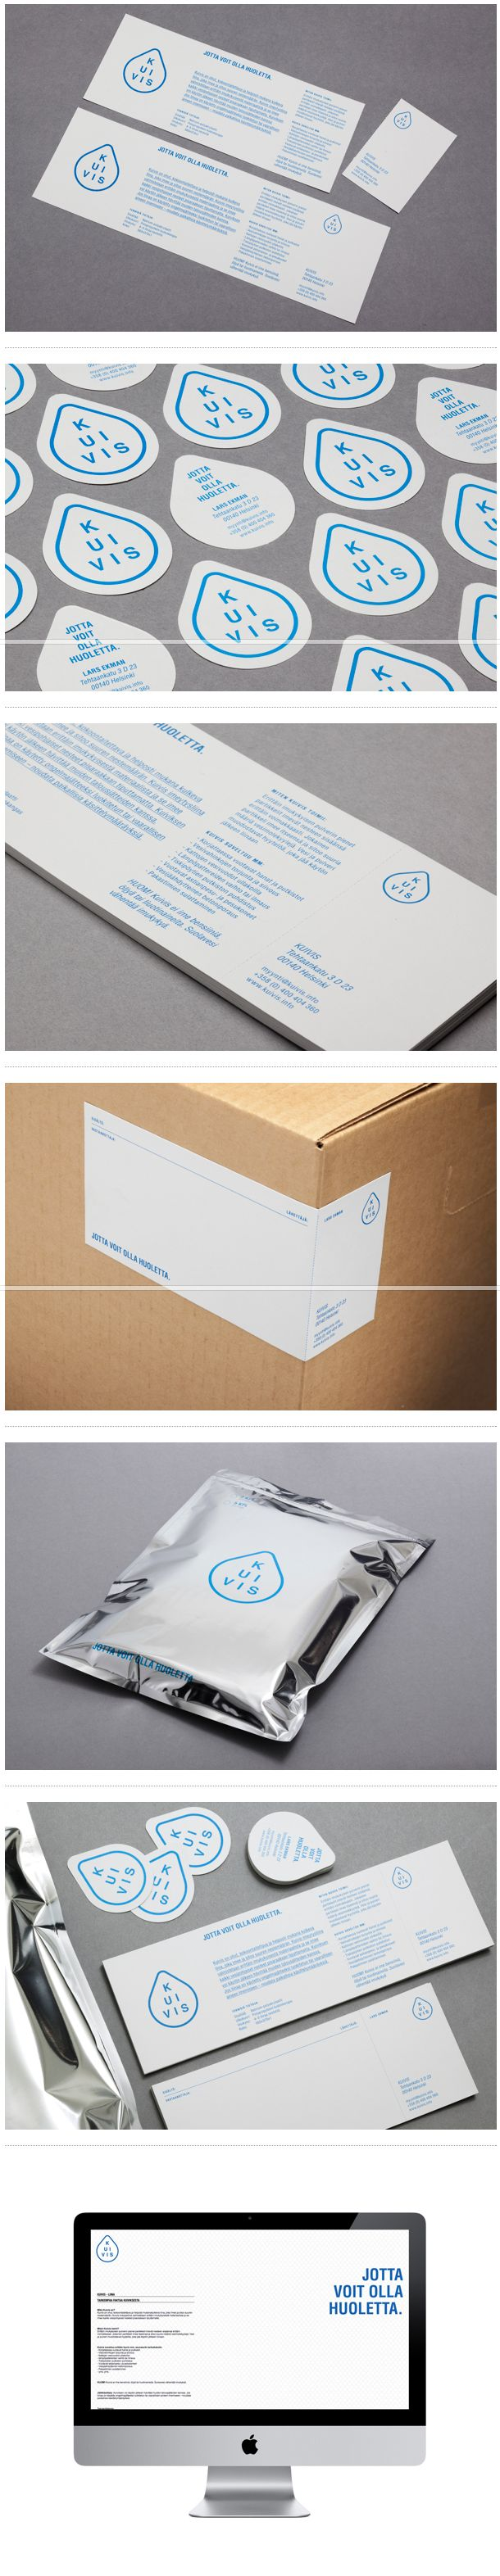 Branding samples - Stunning minimal mockups.